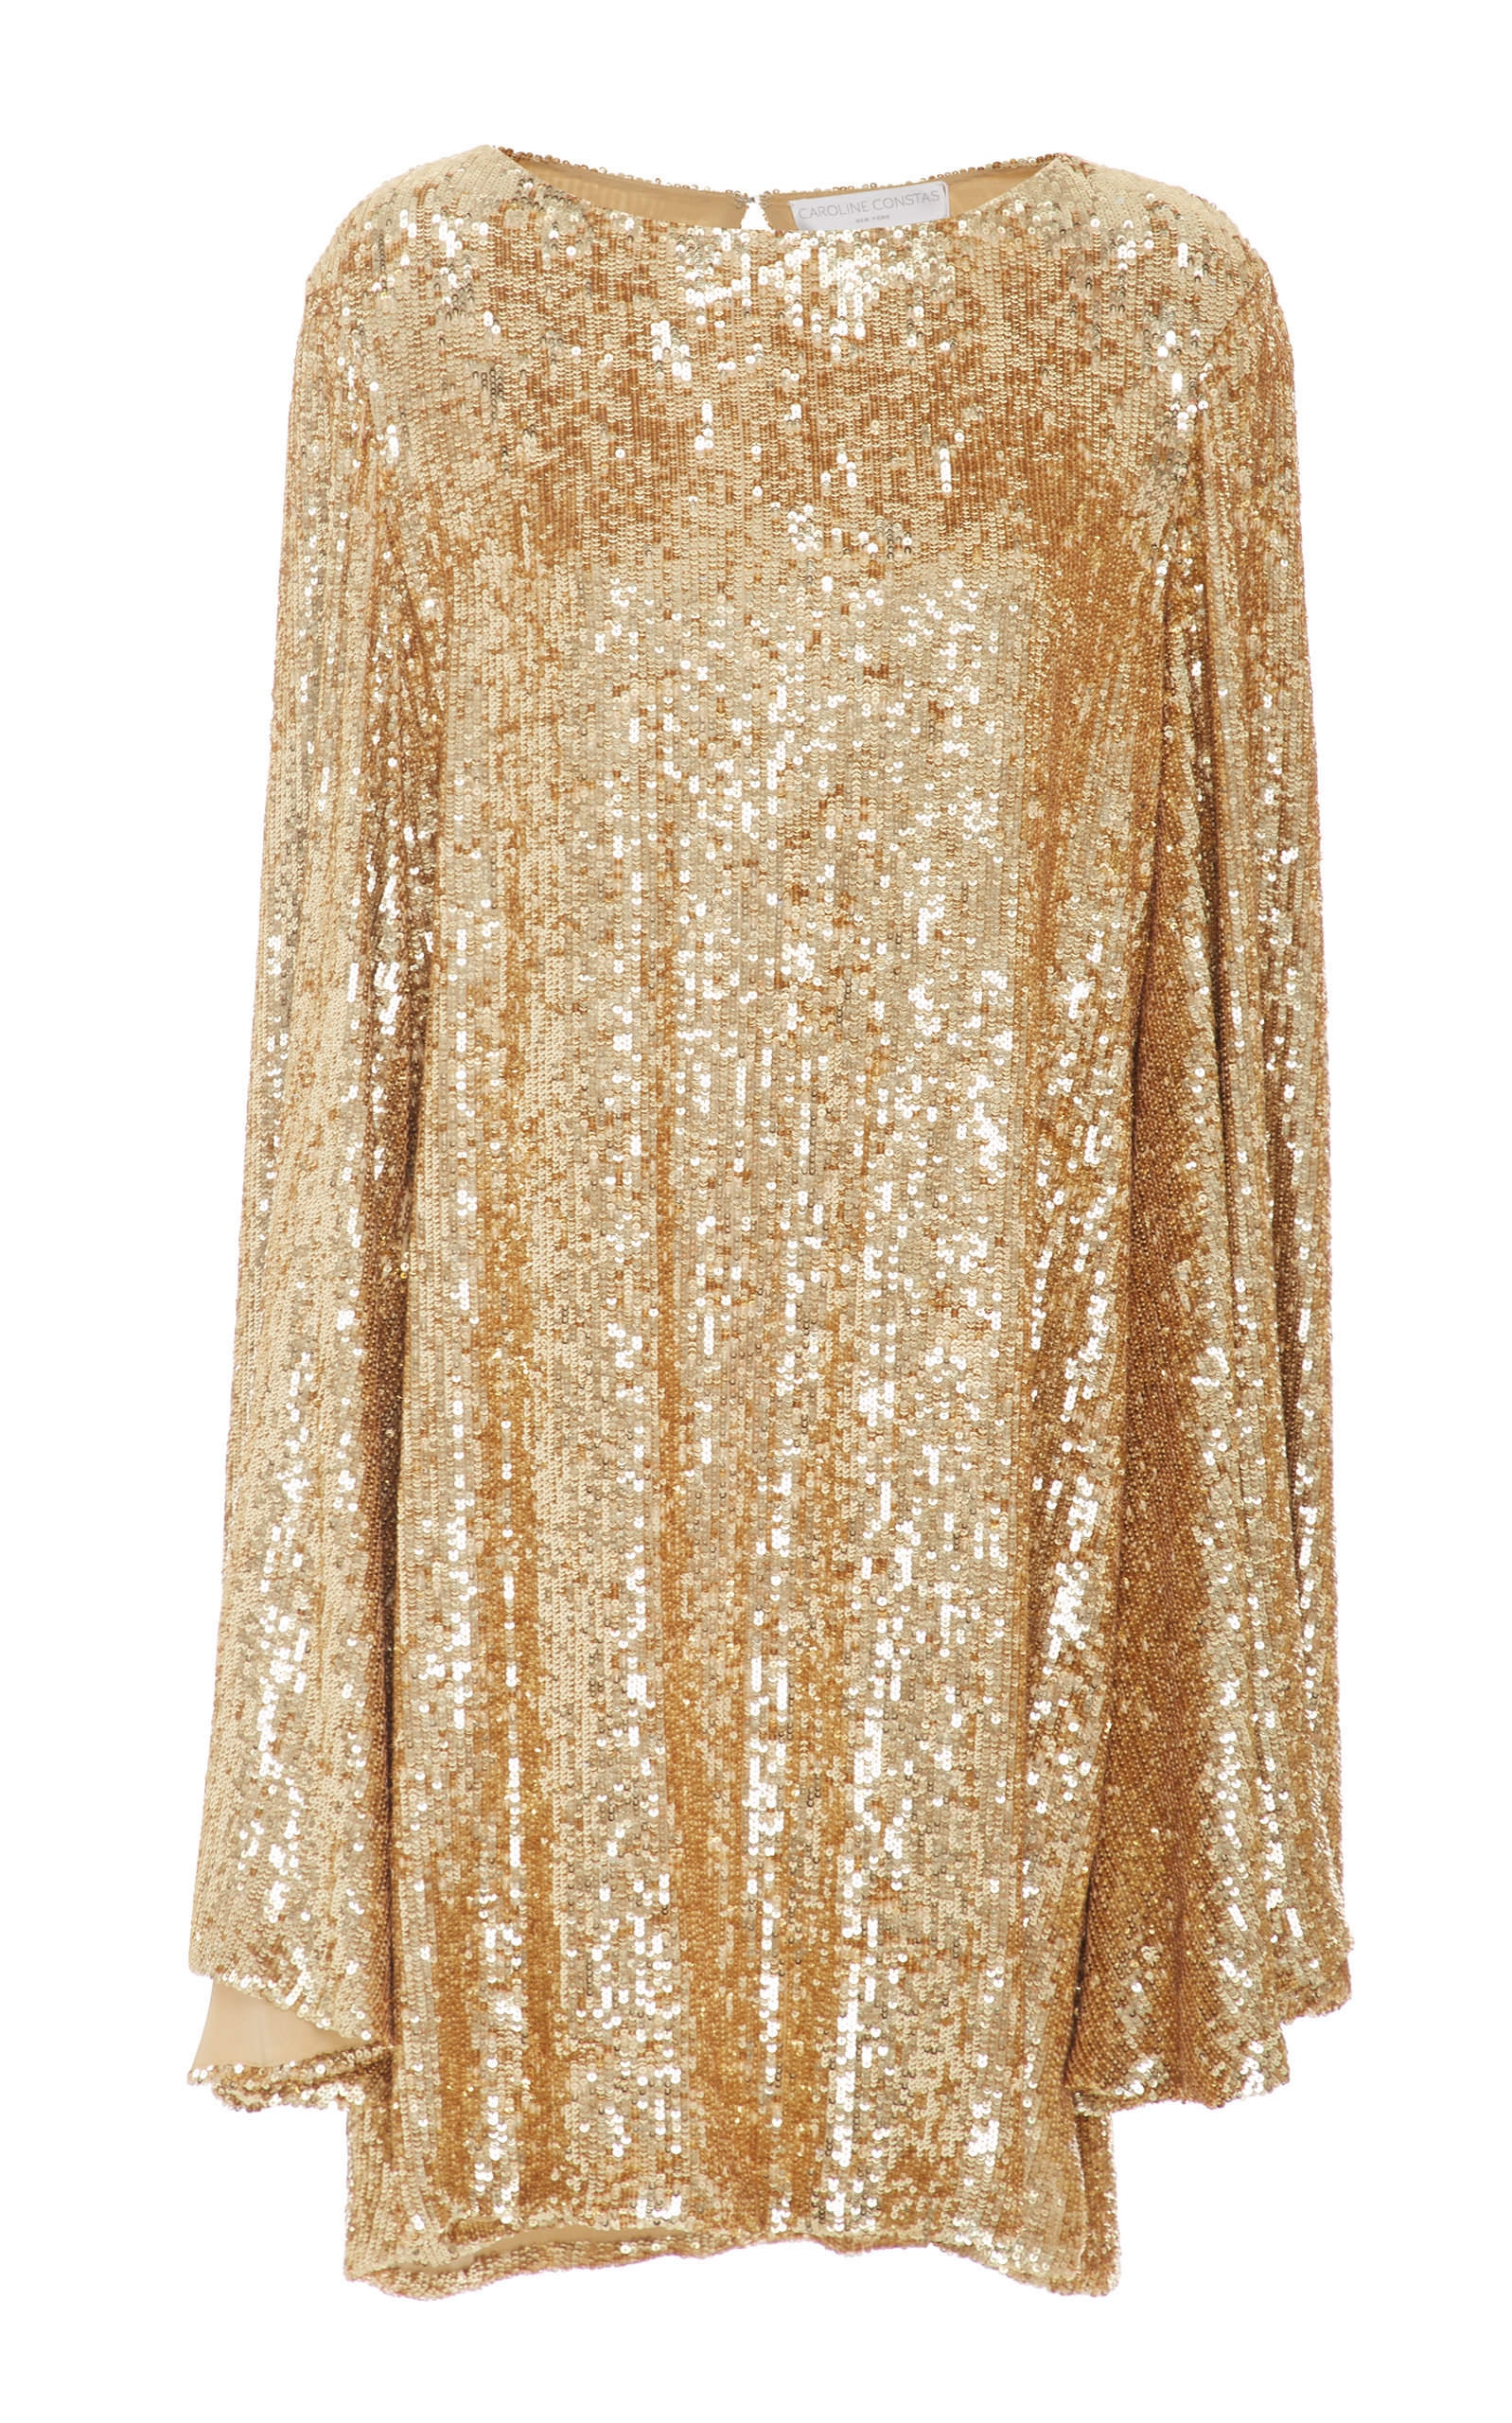 Anya Regal Dress by Caroline Constas